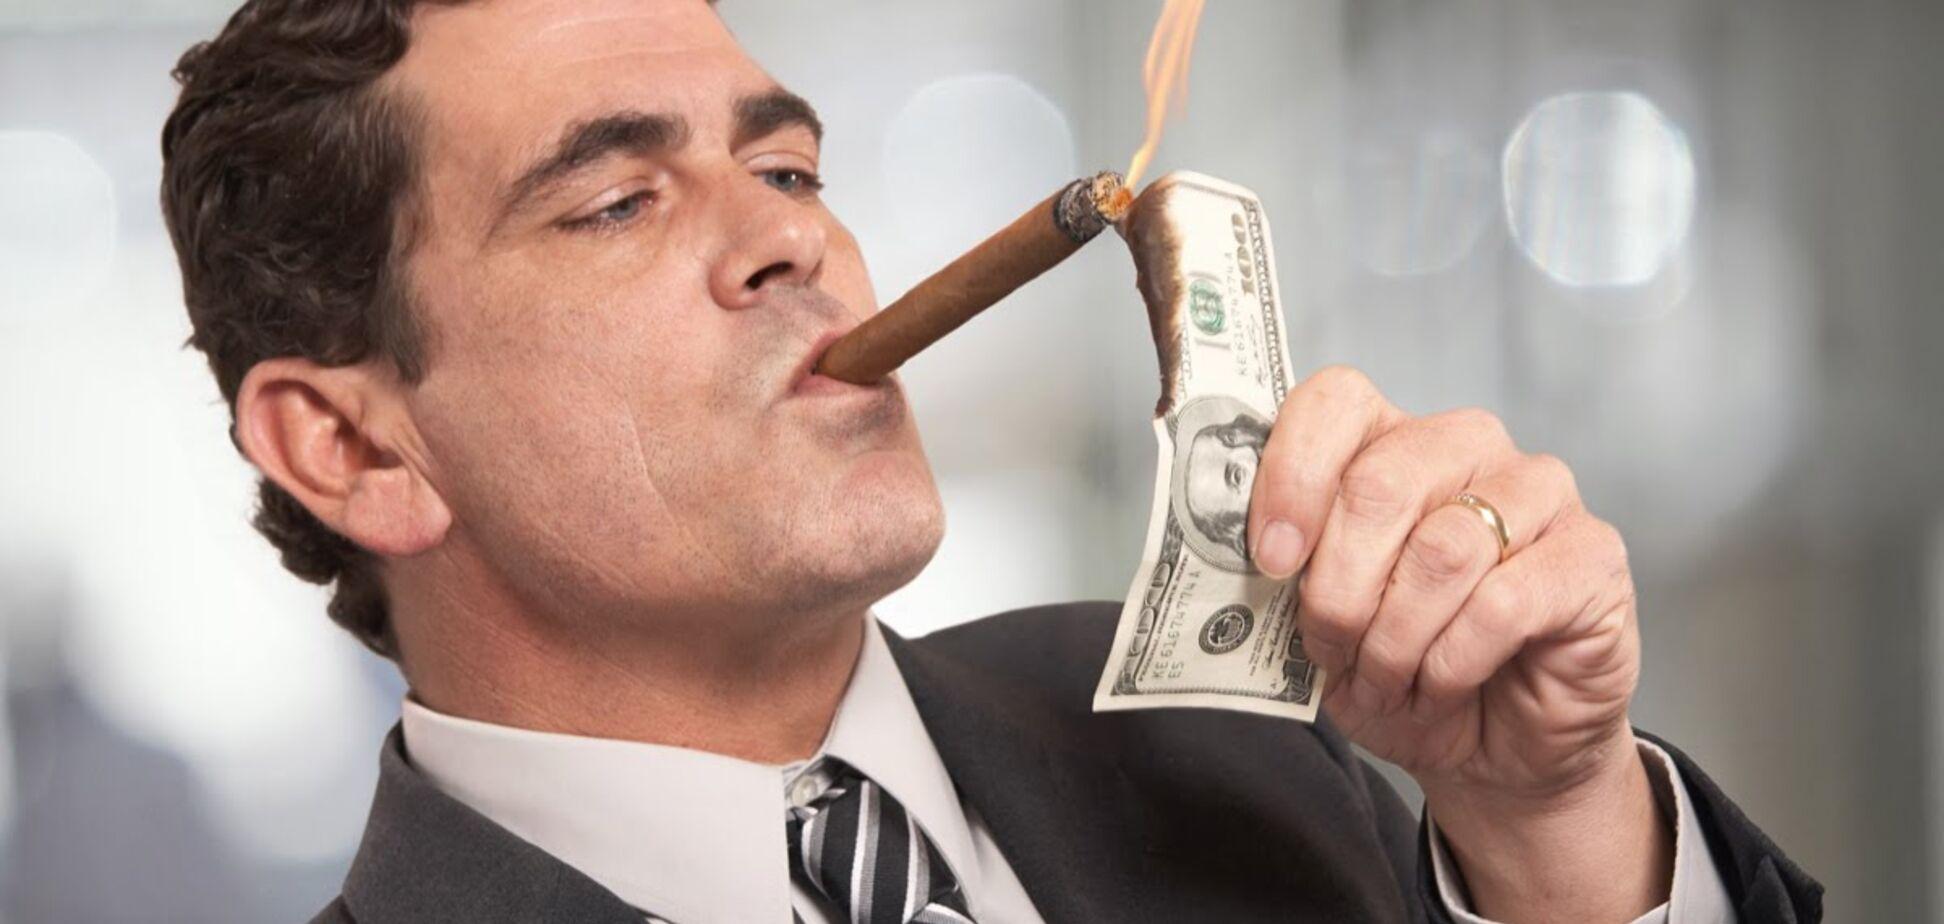 'Богатые - они ж дураки, денег не считают'